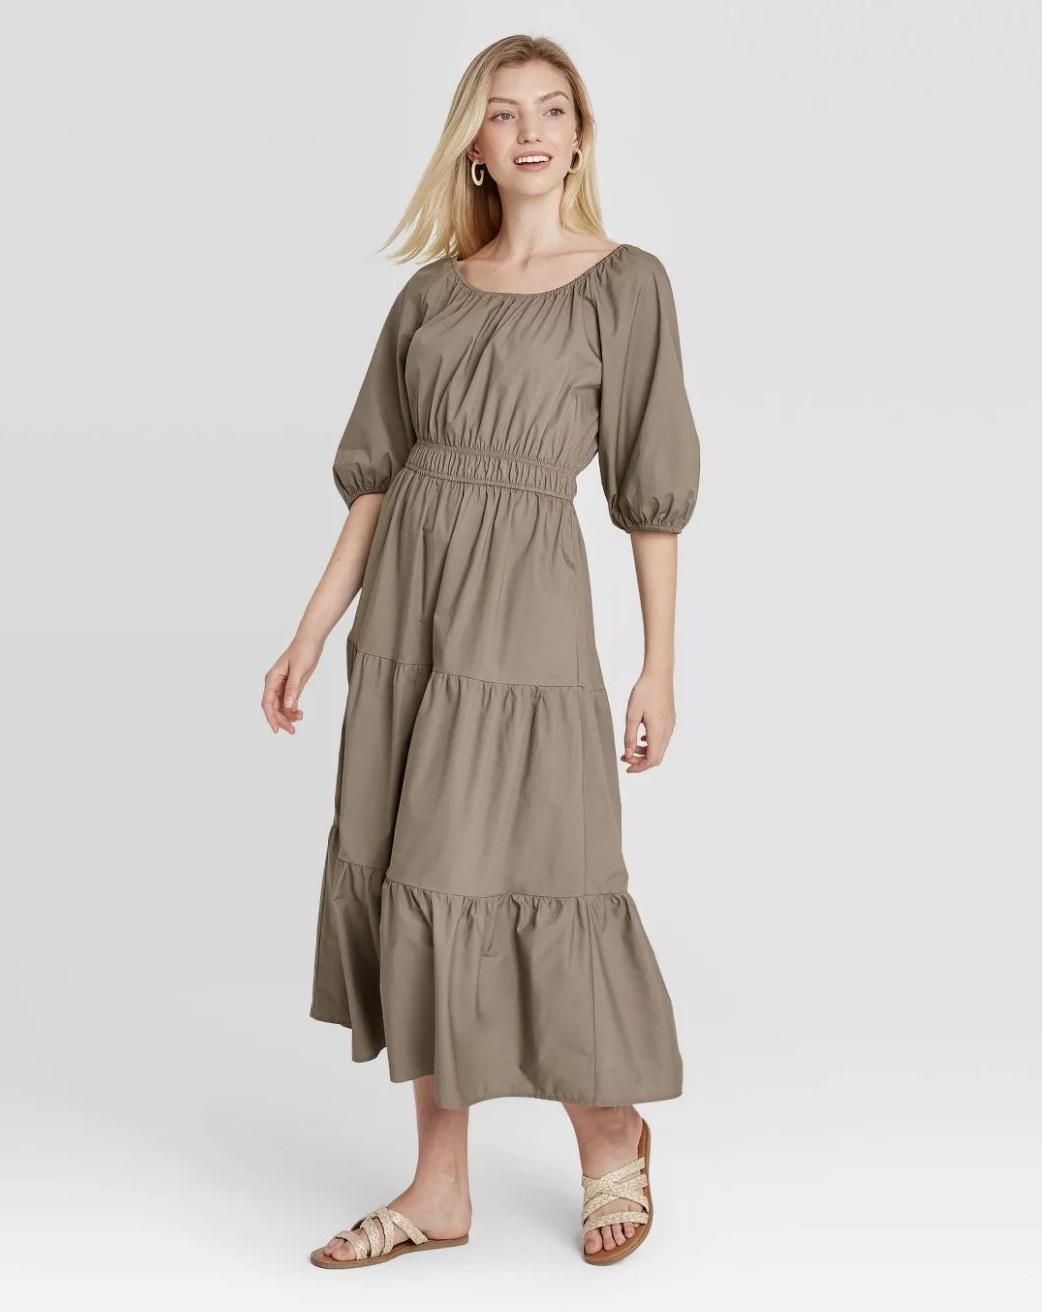 elbow puff-sleeve dress in brown